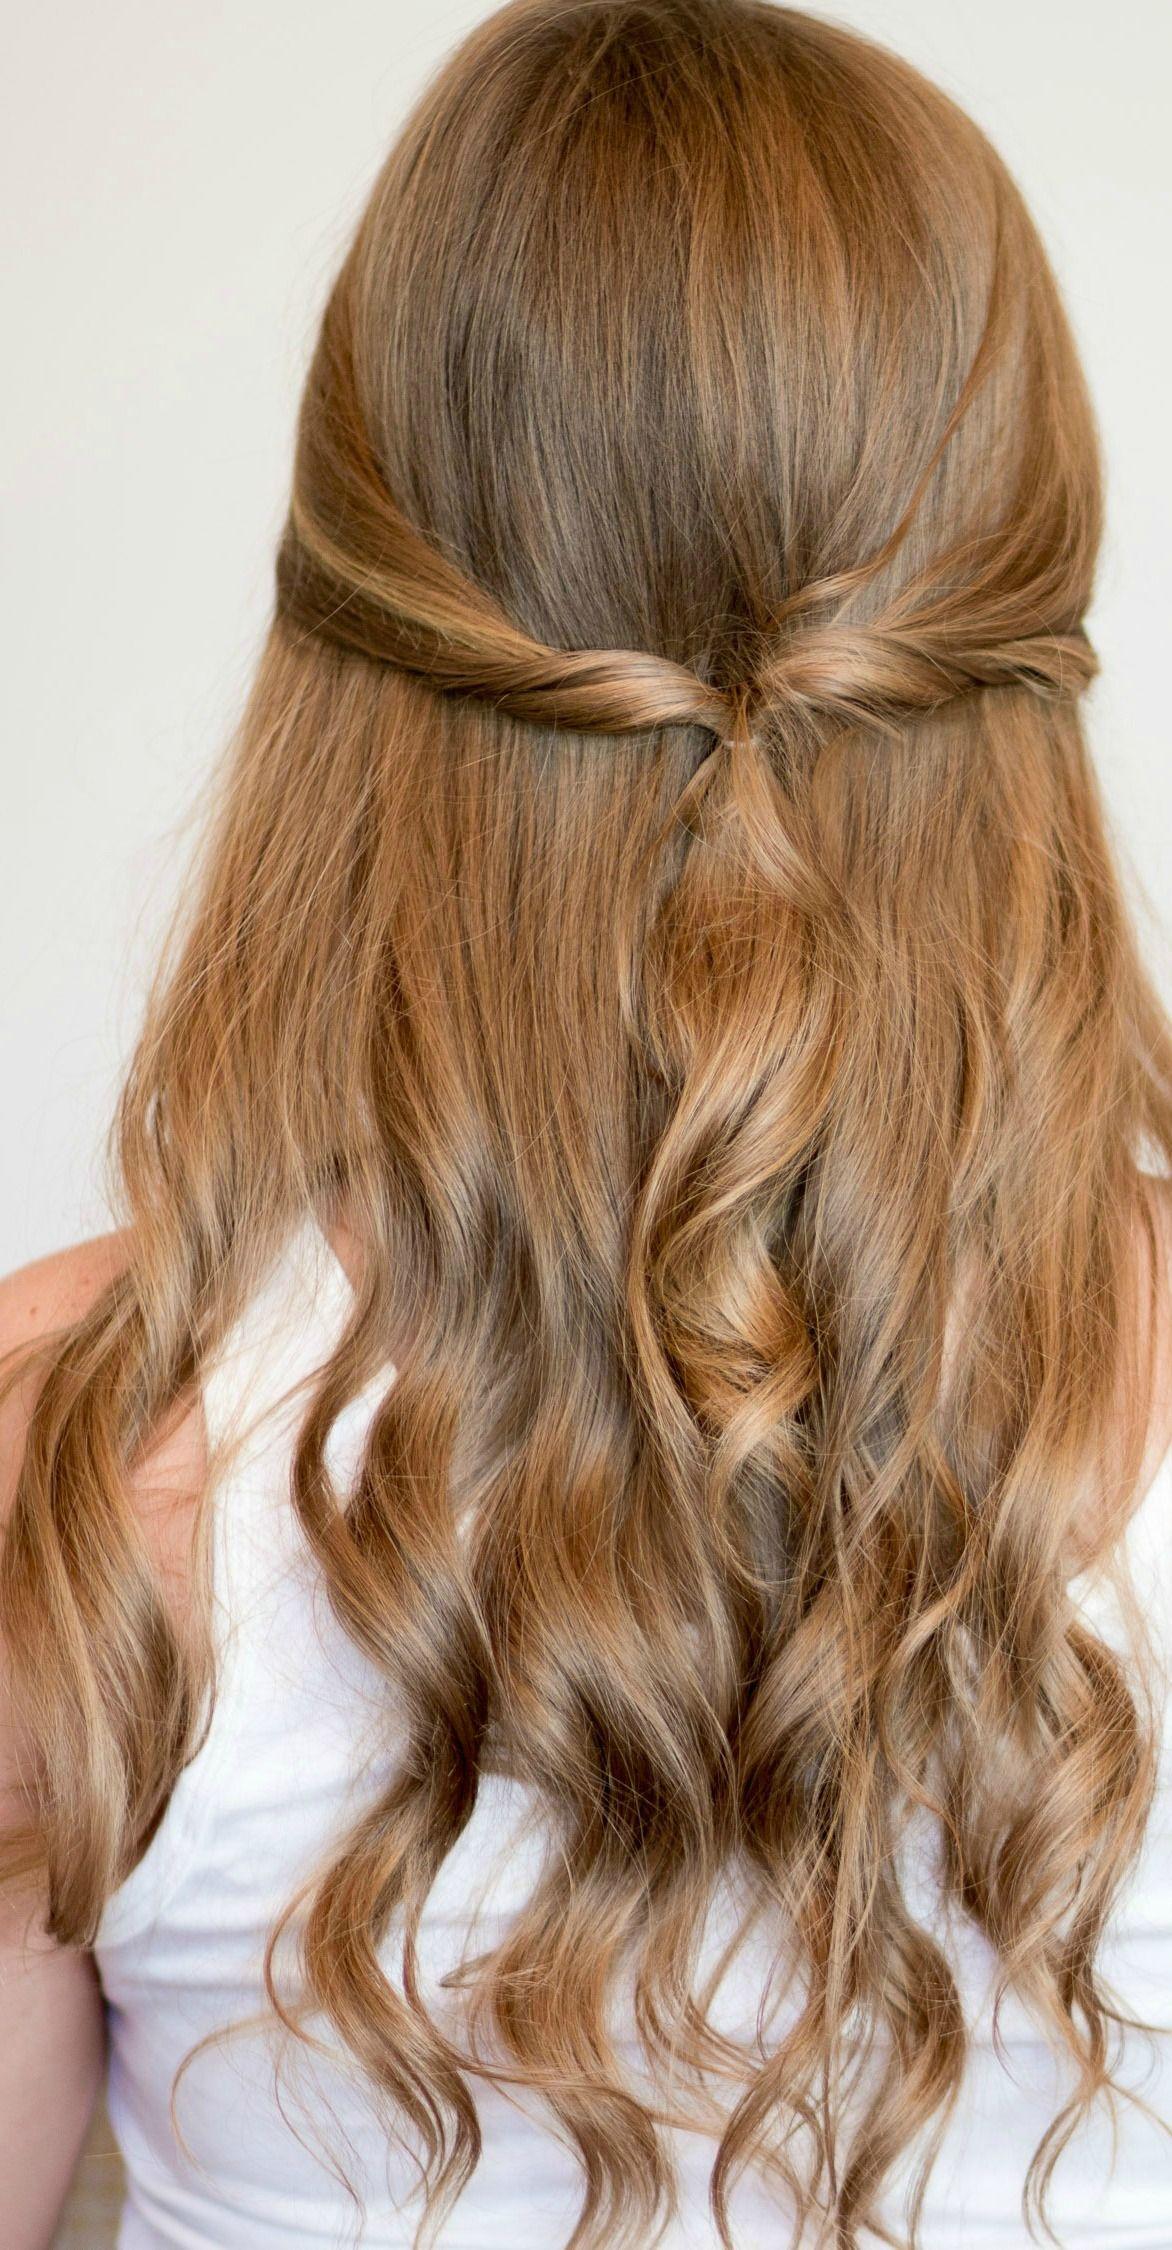 Easy heatless hairstyles for long hair hair pinterest ashley